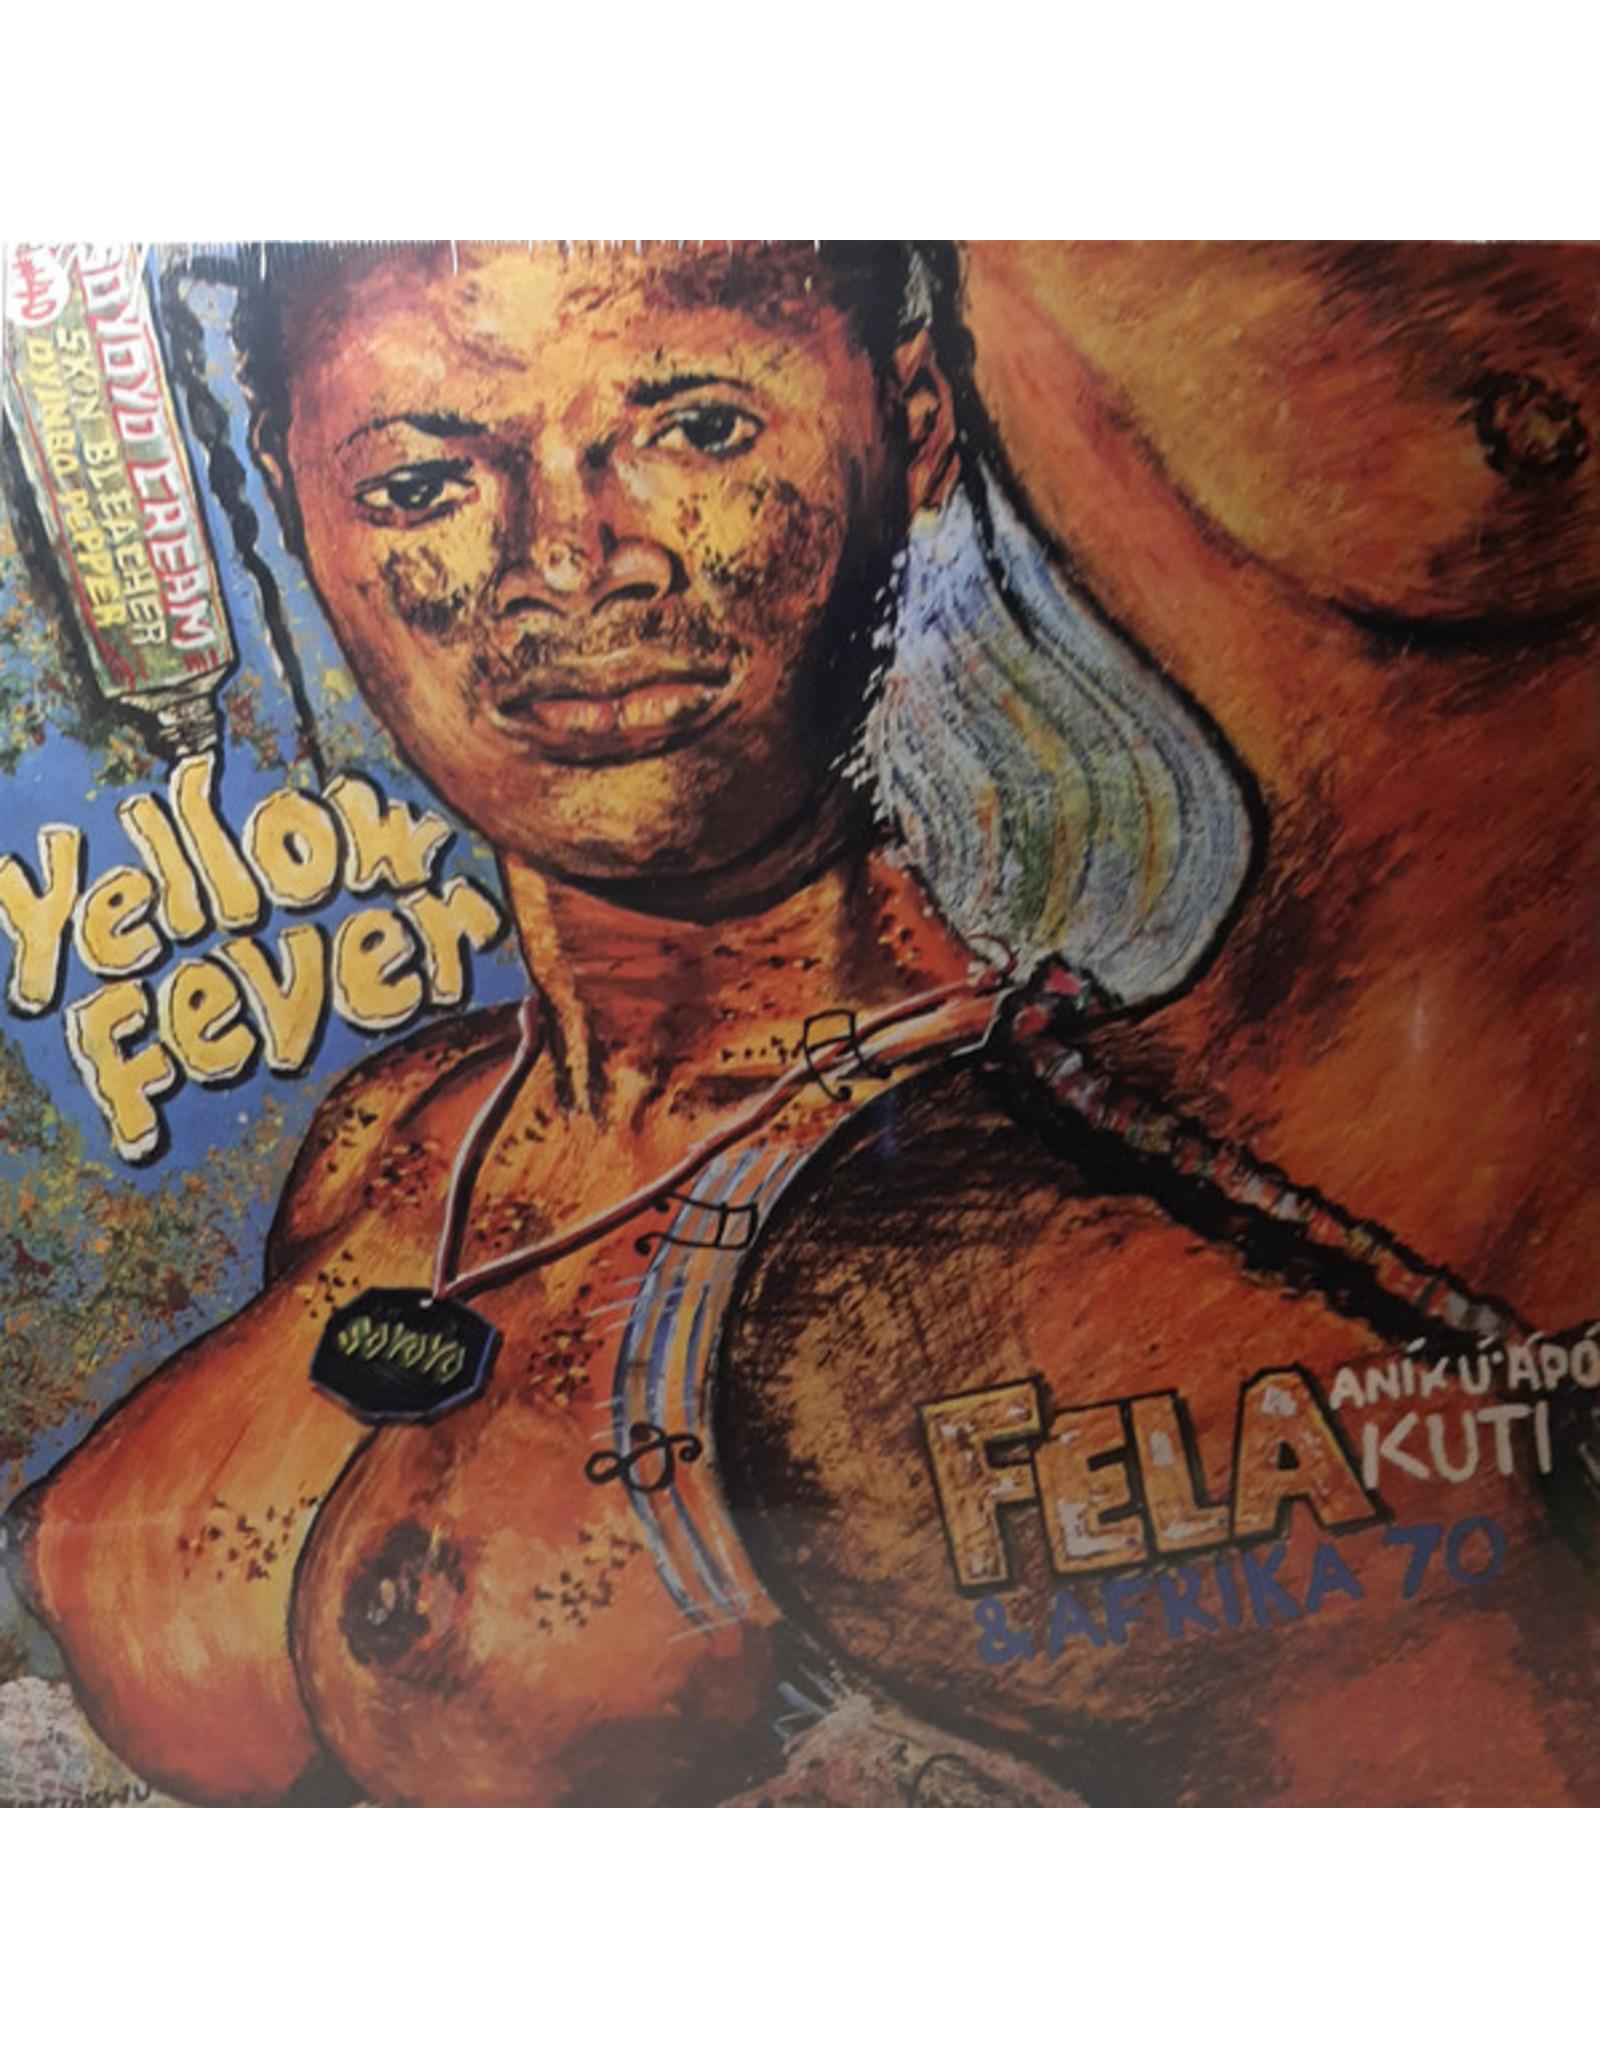 New Vinyl Fela Kuti & Afrika 70 - Yellow Fever LP